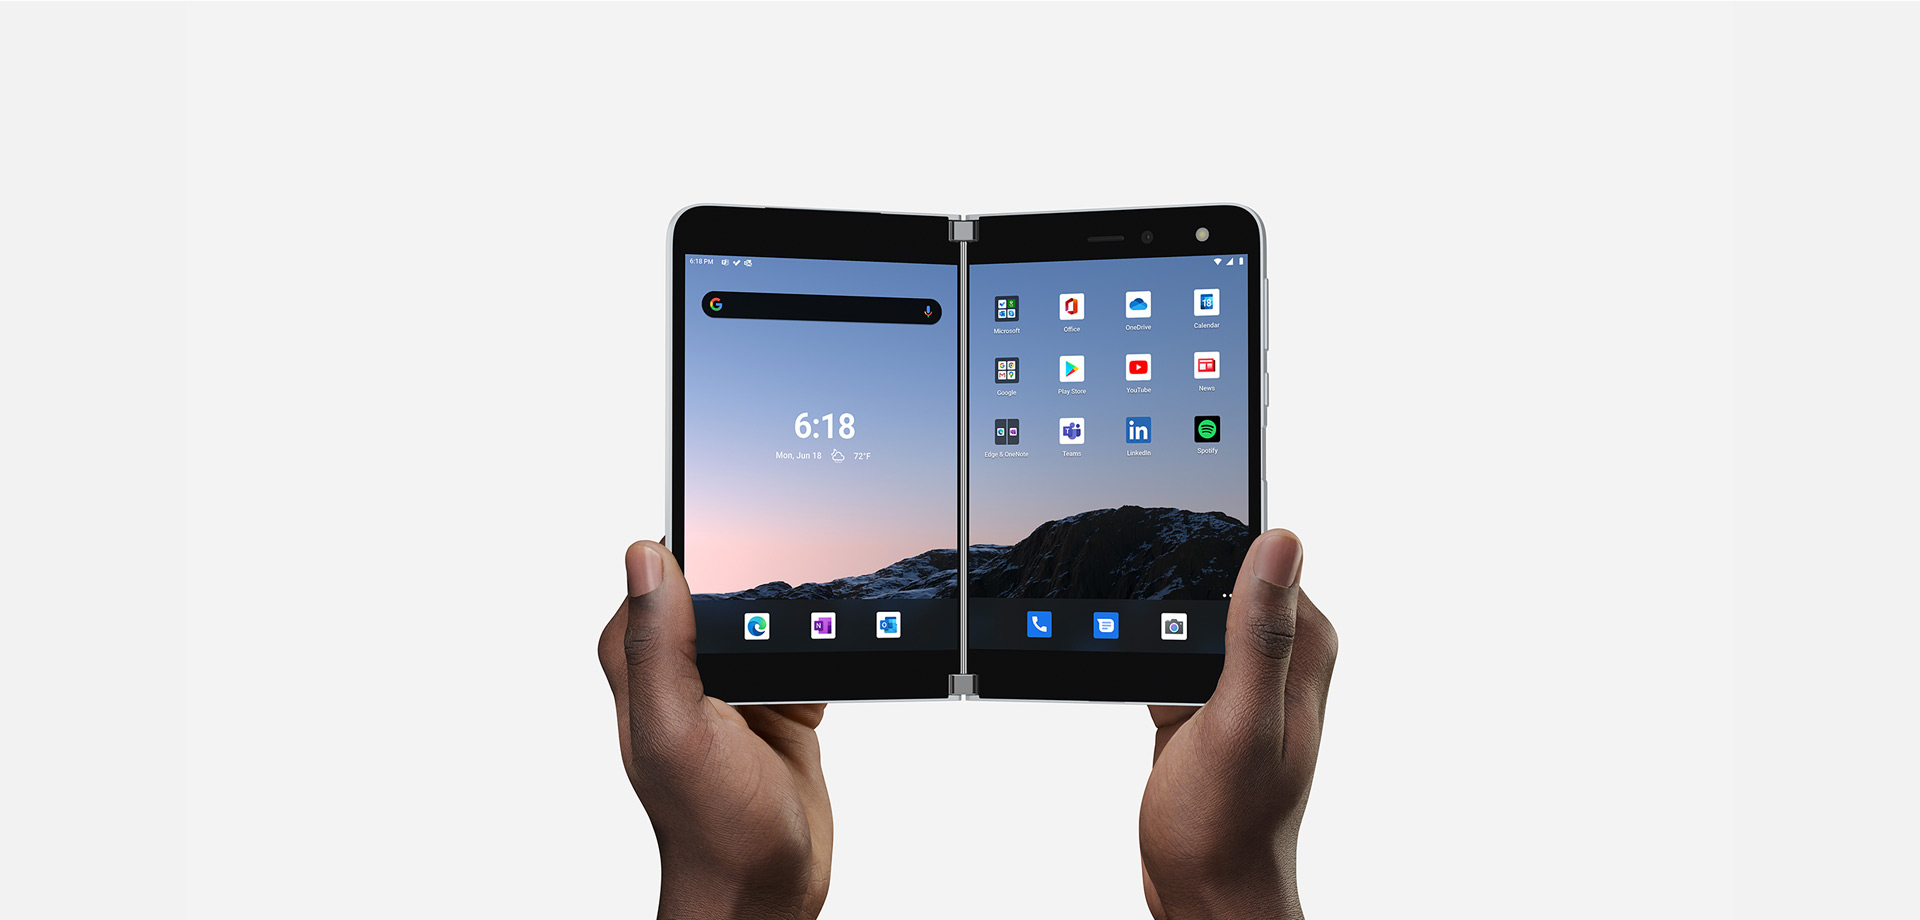 Mirosoft Surface Duo